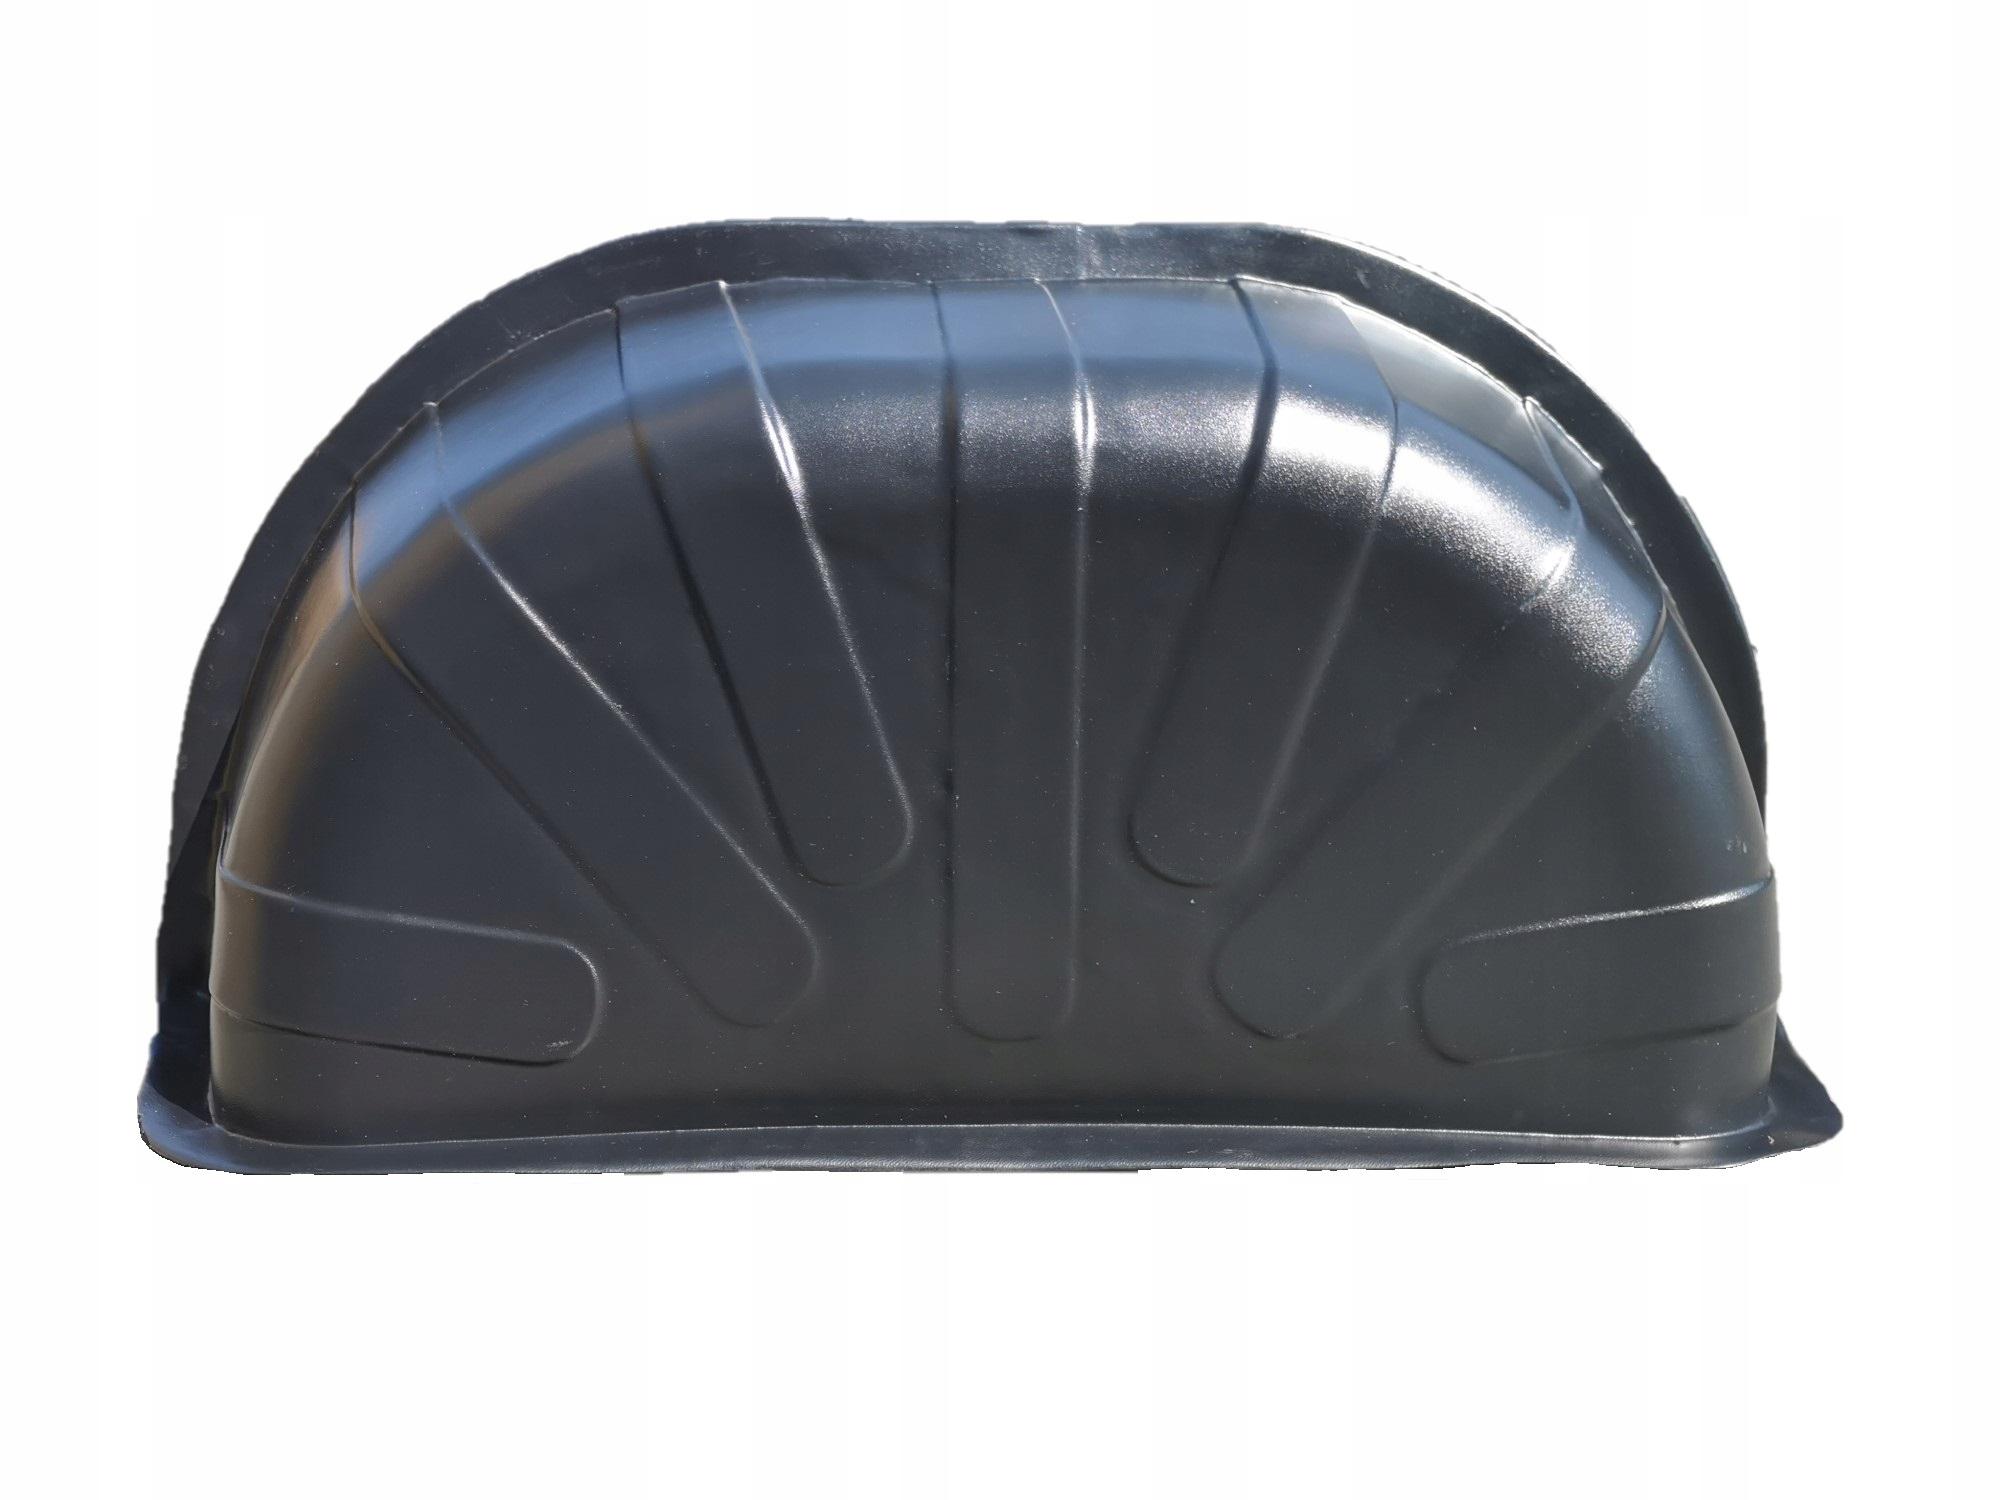 крышка колесные арки накладка ducato boxer jumper 2 шт